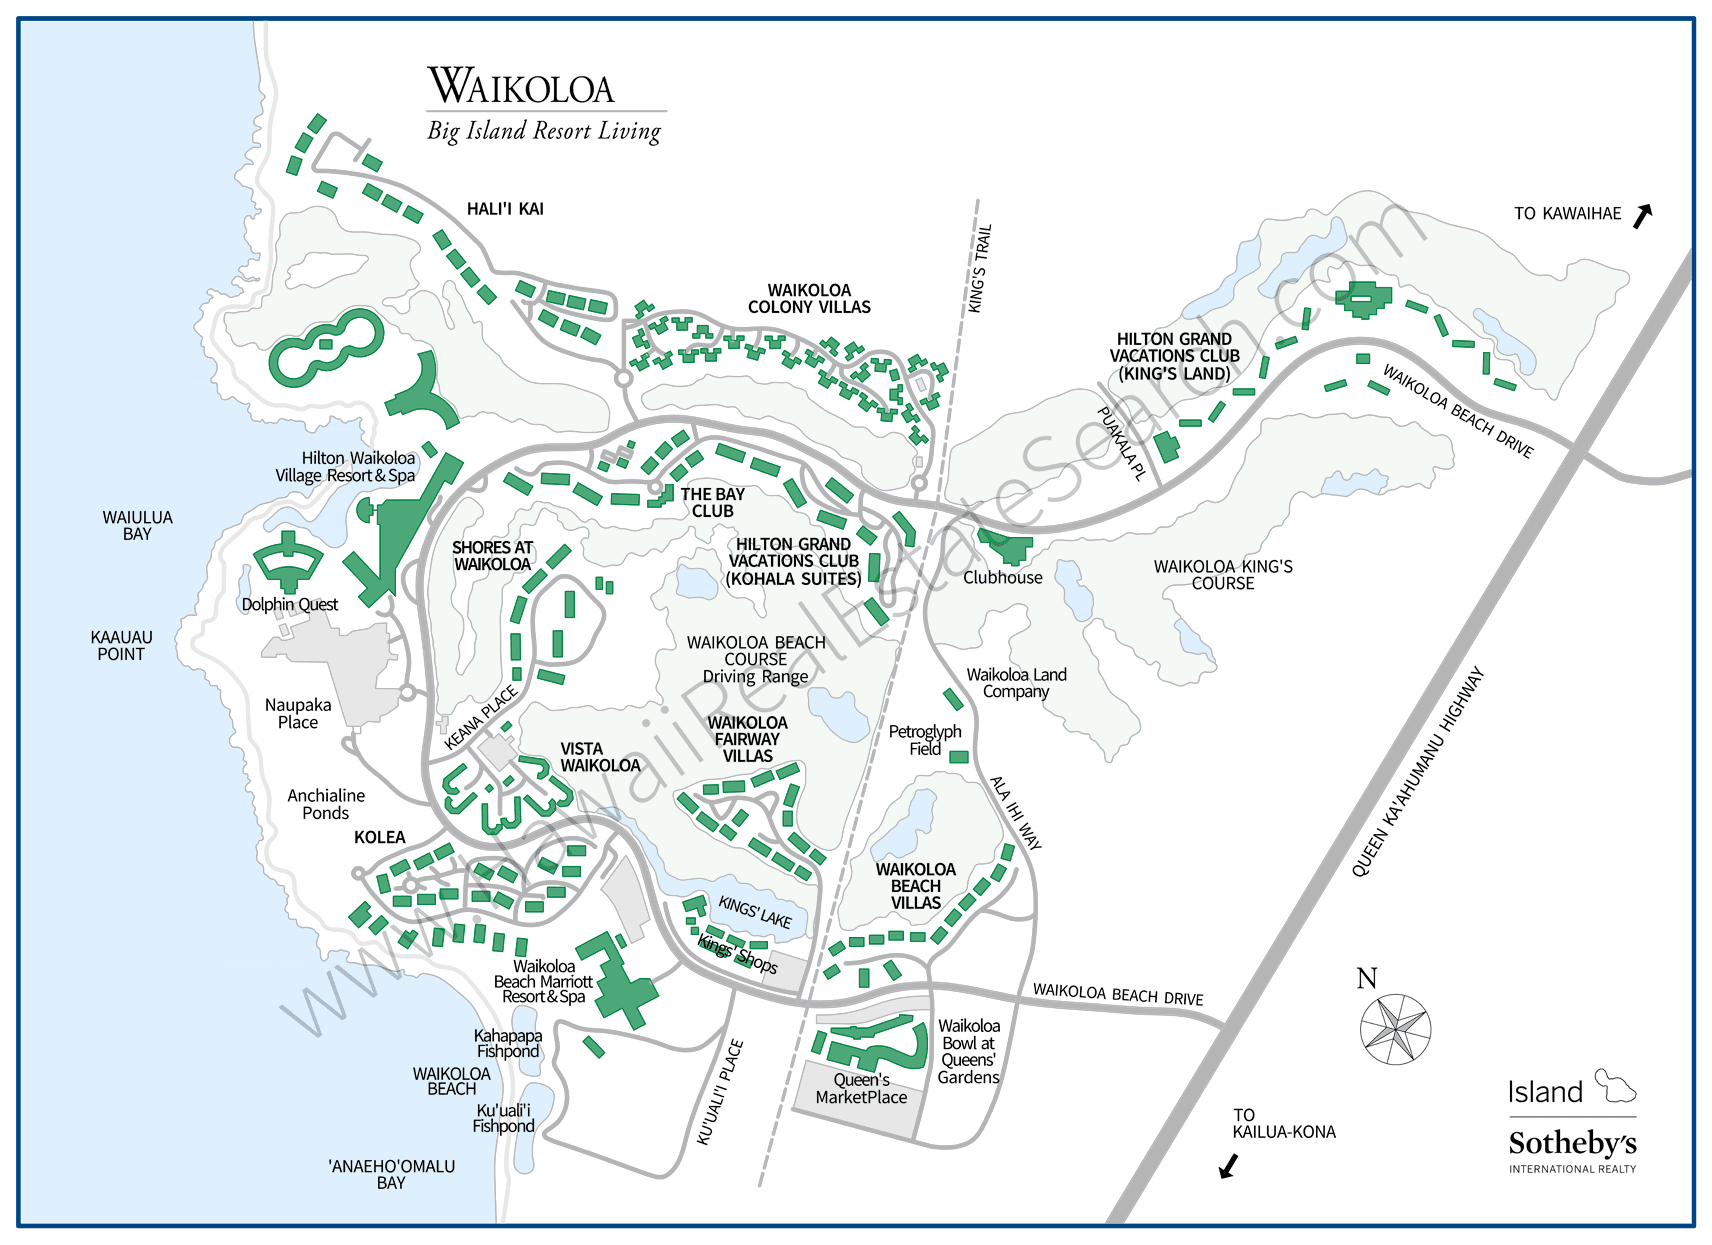 Waikoloa Real Estate | South Kohala, Big Island Homes and Condos on wailea beach marriott map, hali'i kai map, fairway villas map, napili point map, halii kai map, hawaii kai map, luana kai map, constantine map, grand wailea map, pauoa beach map, oran map,